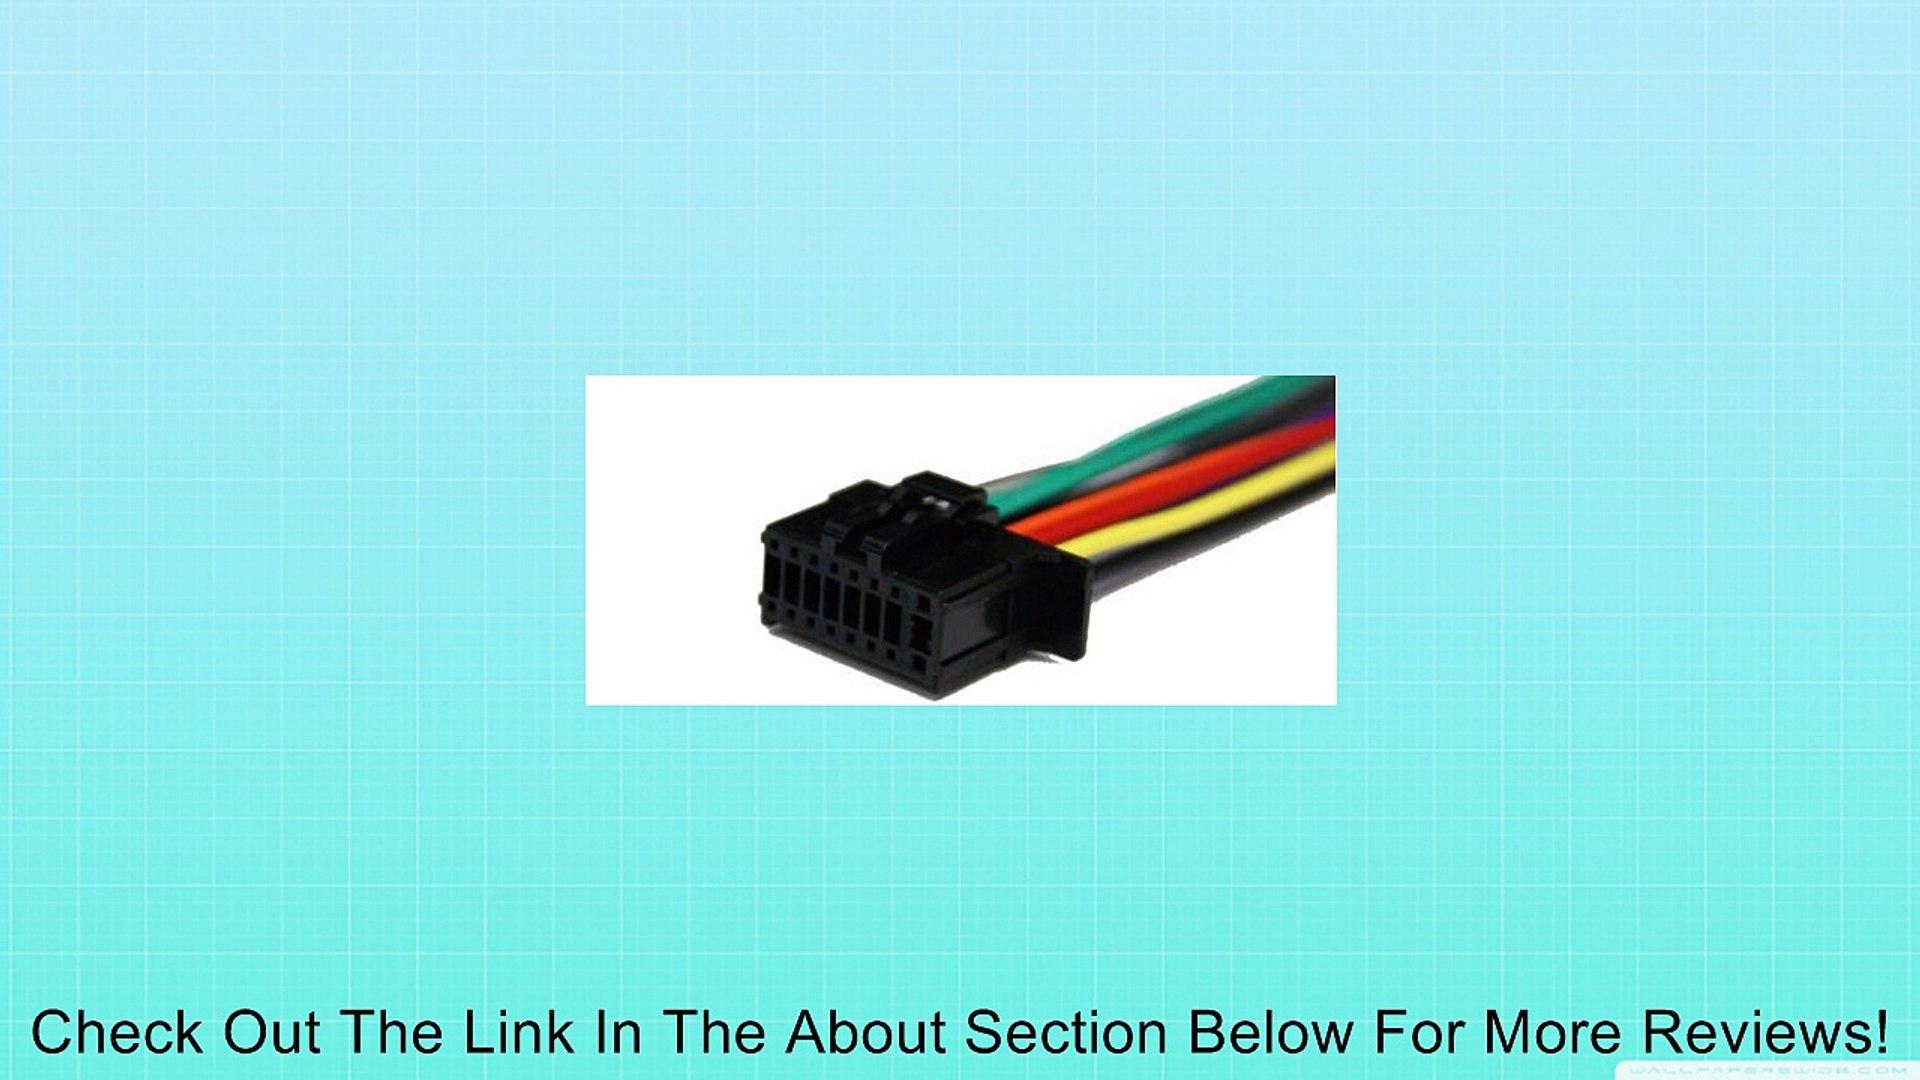 Pioneer Wire Harness DEH-P4200UB DEH-X6500BT DEH-X65BT FH-X700BT DEH-150MP on deh-x3500ui wiring diagram, deh-x6500bt wiring diagram, deh-3400ub wiring diagram, deh-150mp wiring diagram, pioneer radio wiring diagram, deh-4400hd wiring diagram, fh-x700bt wiring diagram,